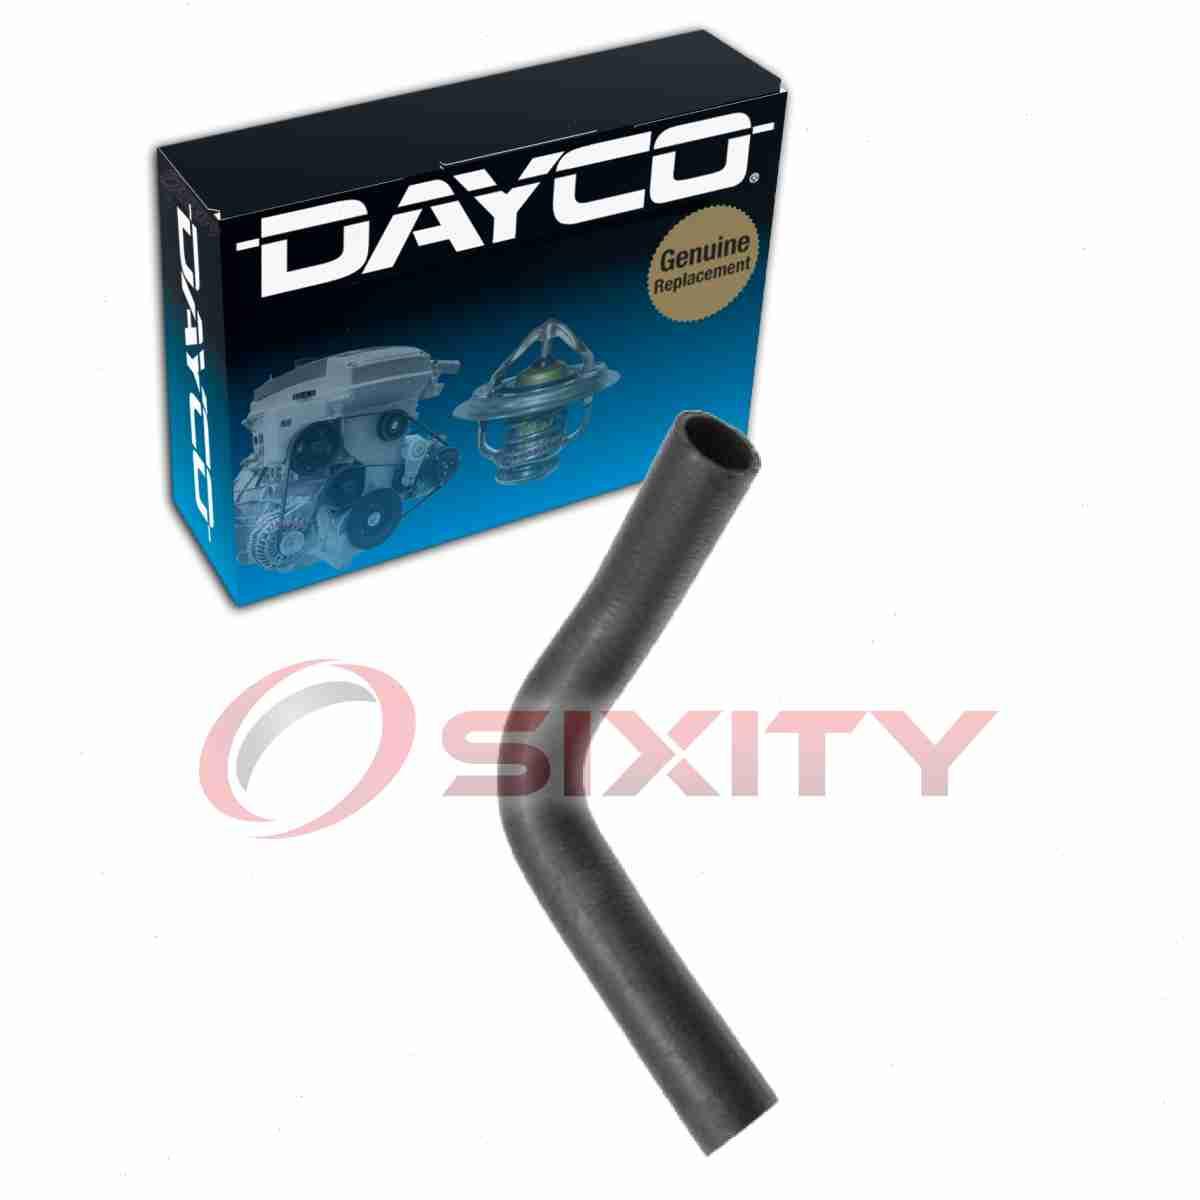 Dayco 70306 Curved Radiator Hose